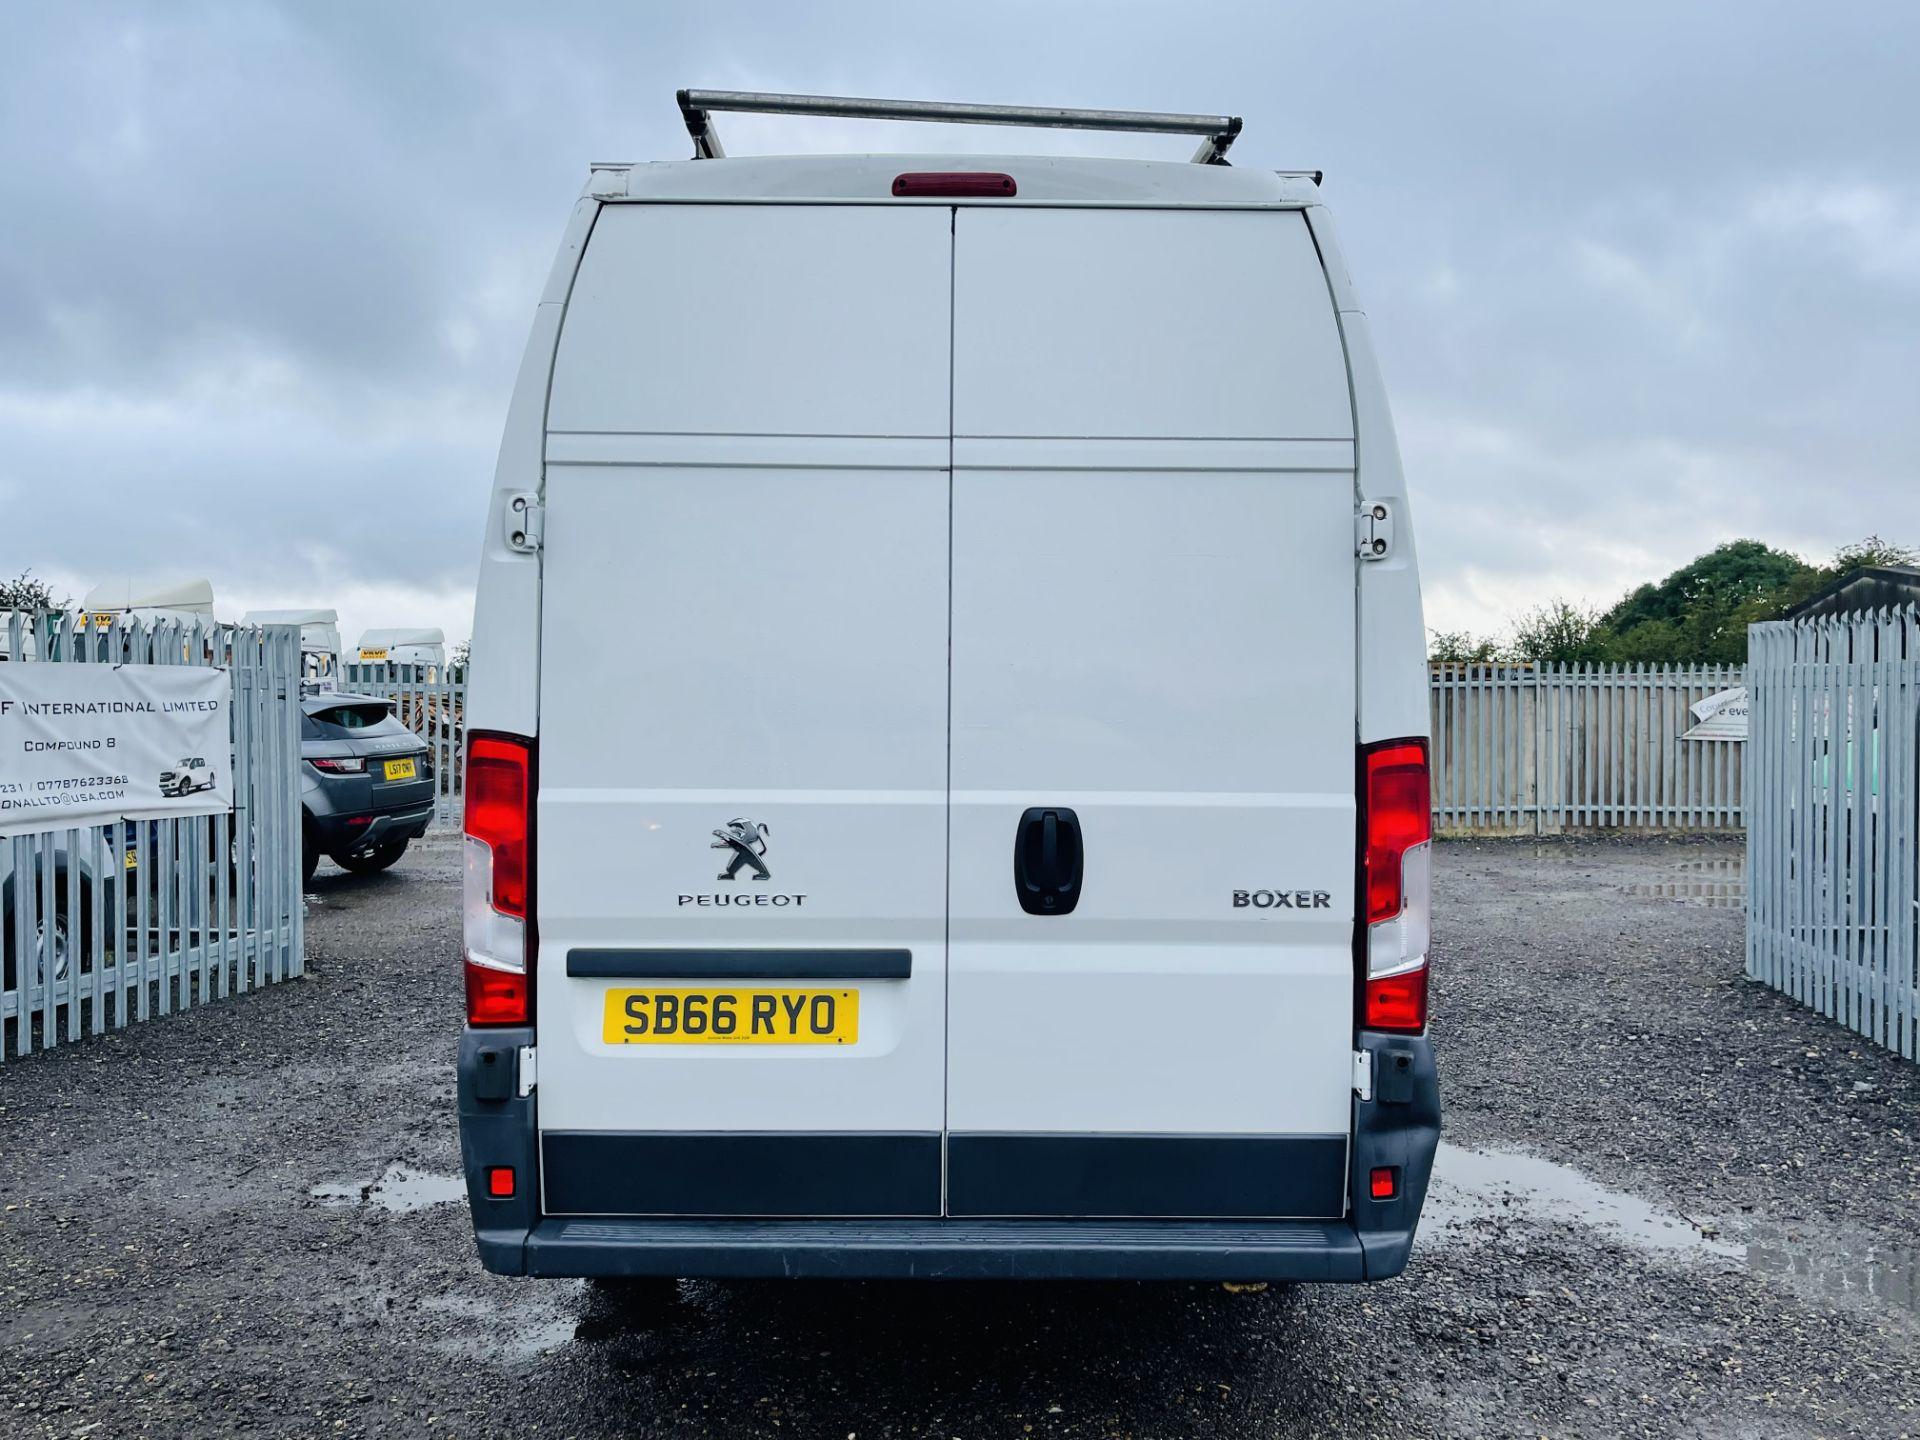 ** ON SALE ** Peugeot Boxer 2.0 BlueHDI L4 H3 2017 '66 Reg' Panel Van - LCV - Euro 6b ULEZ Compliant - Image 11 of 18